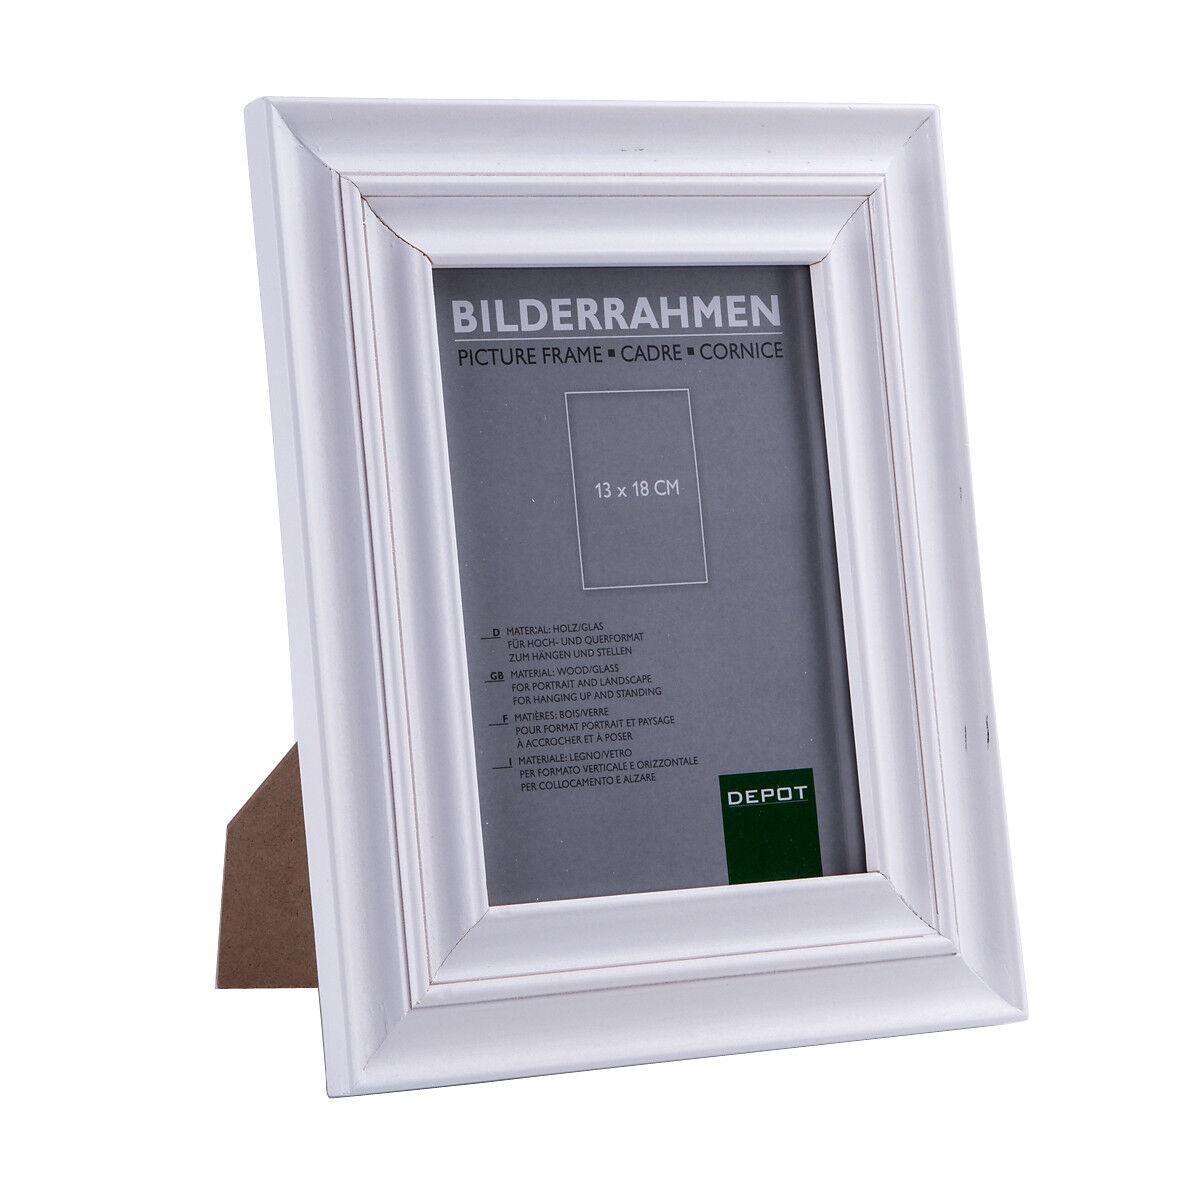 Ikea Holz Bilderrahmen 13X18 ~   bilderrahmen bilder bildzubehör bilderrahmen holzrahmen metall und